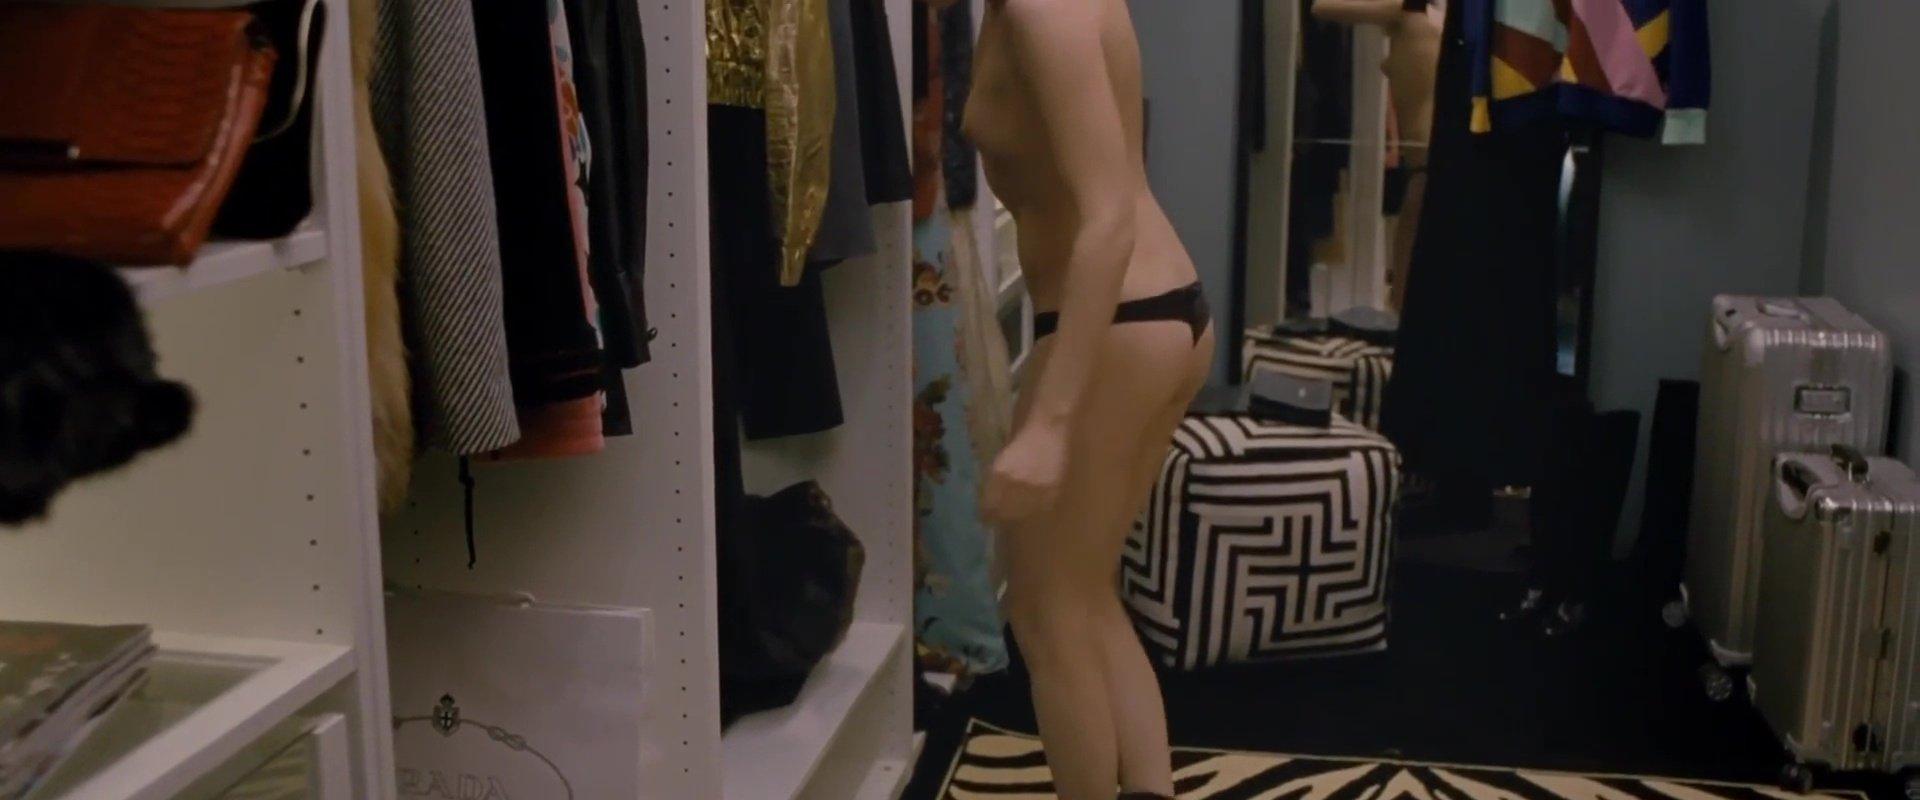 Sorry, that Kristen stewart nuda video apologise, but